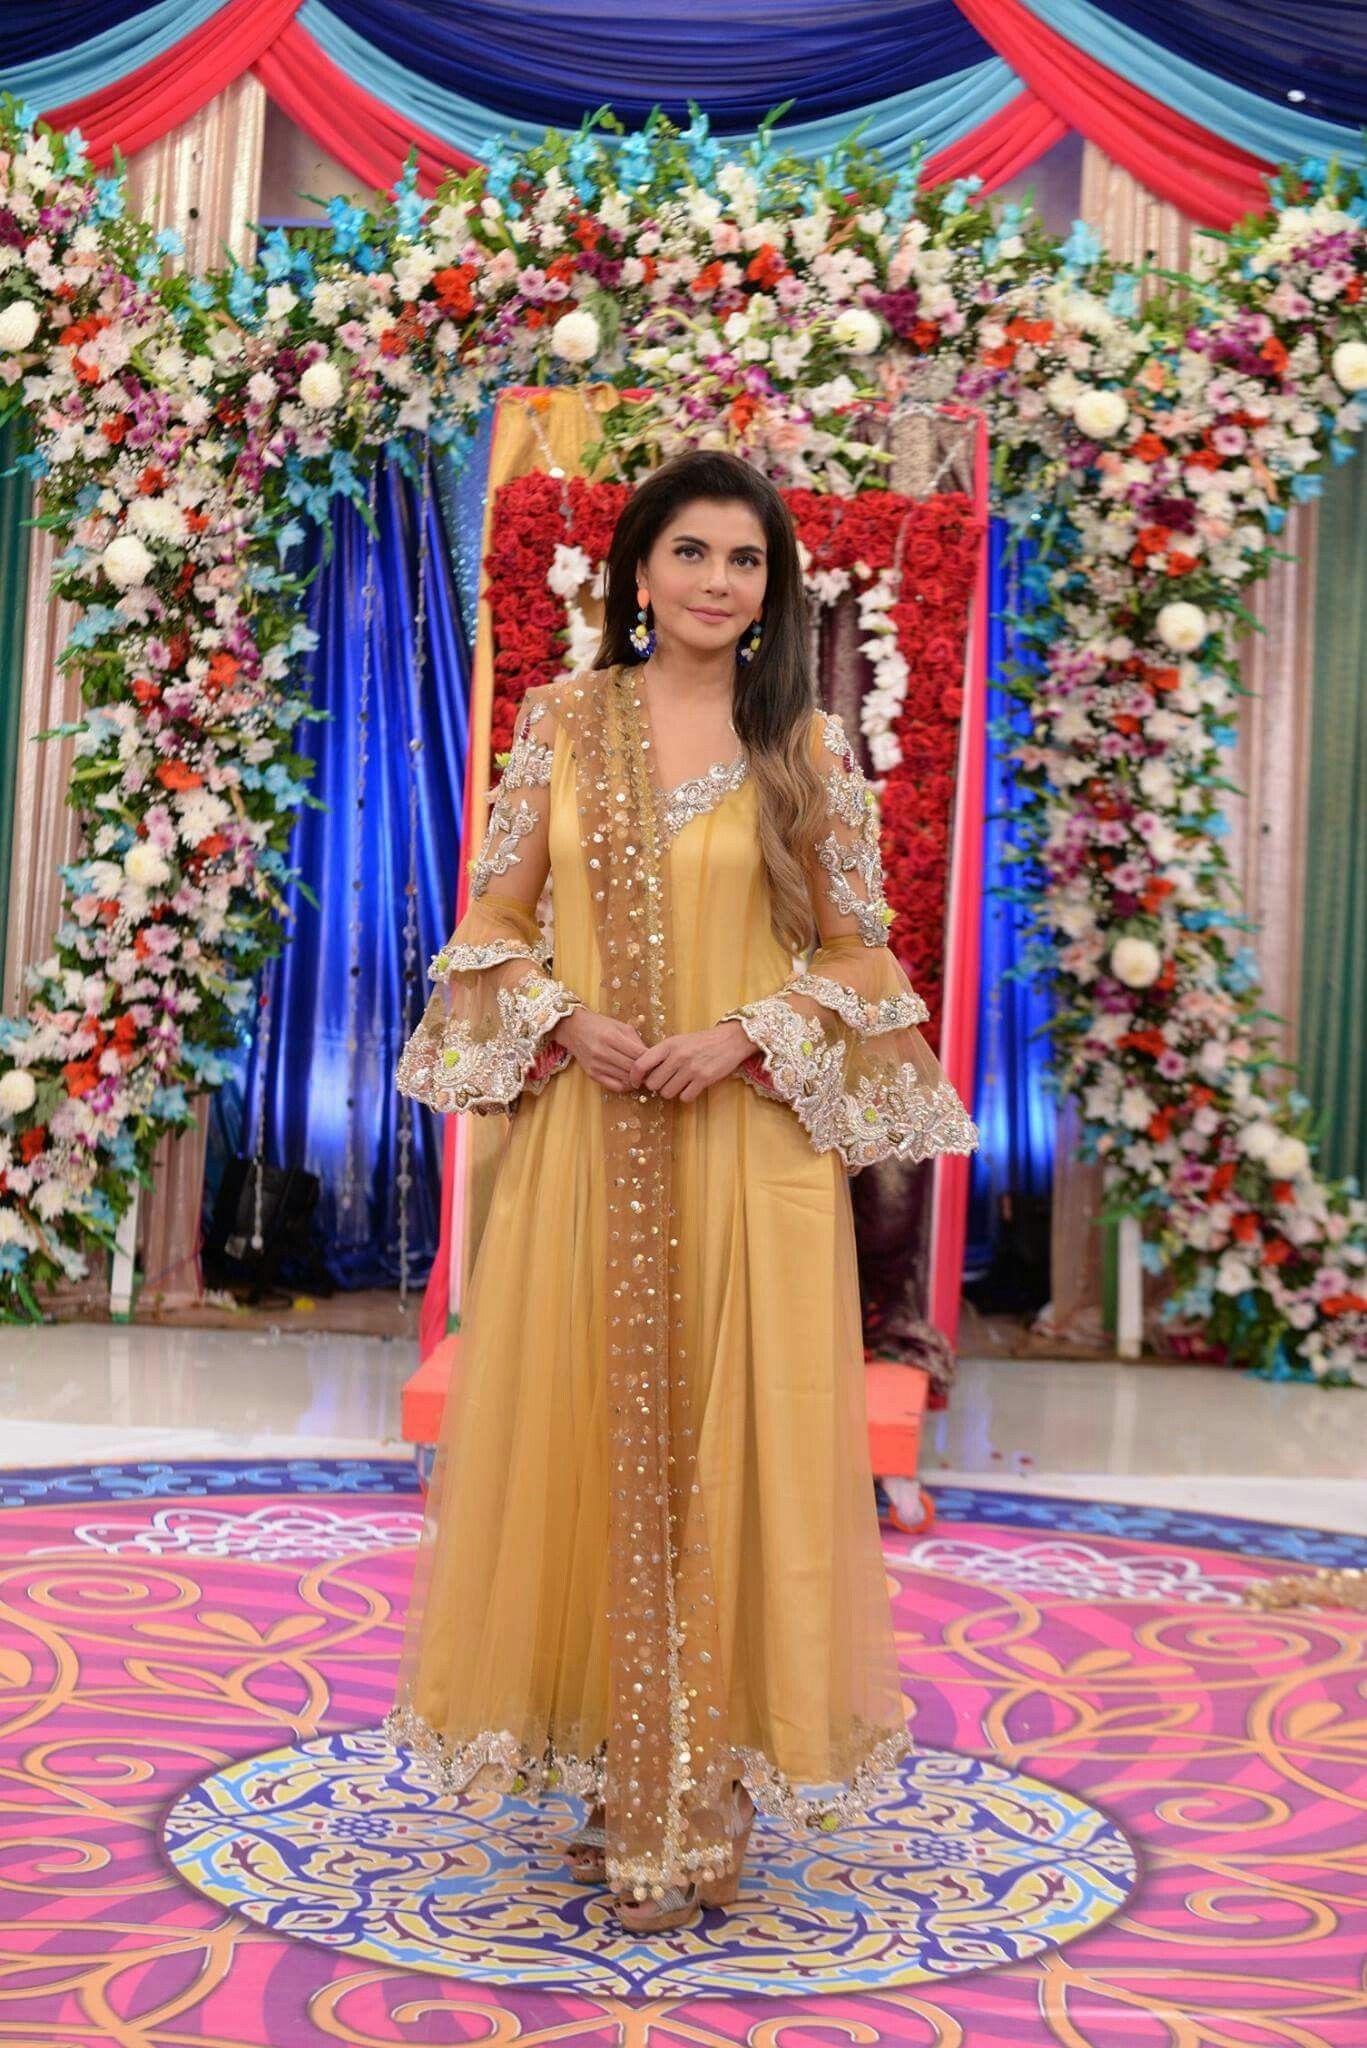 Royal blue n yellow dress  GMP beauty queen special week  PaKiStAni actress  Pinterest